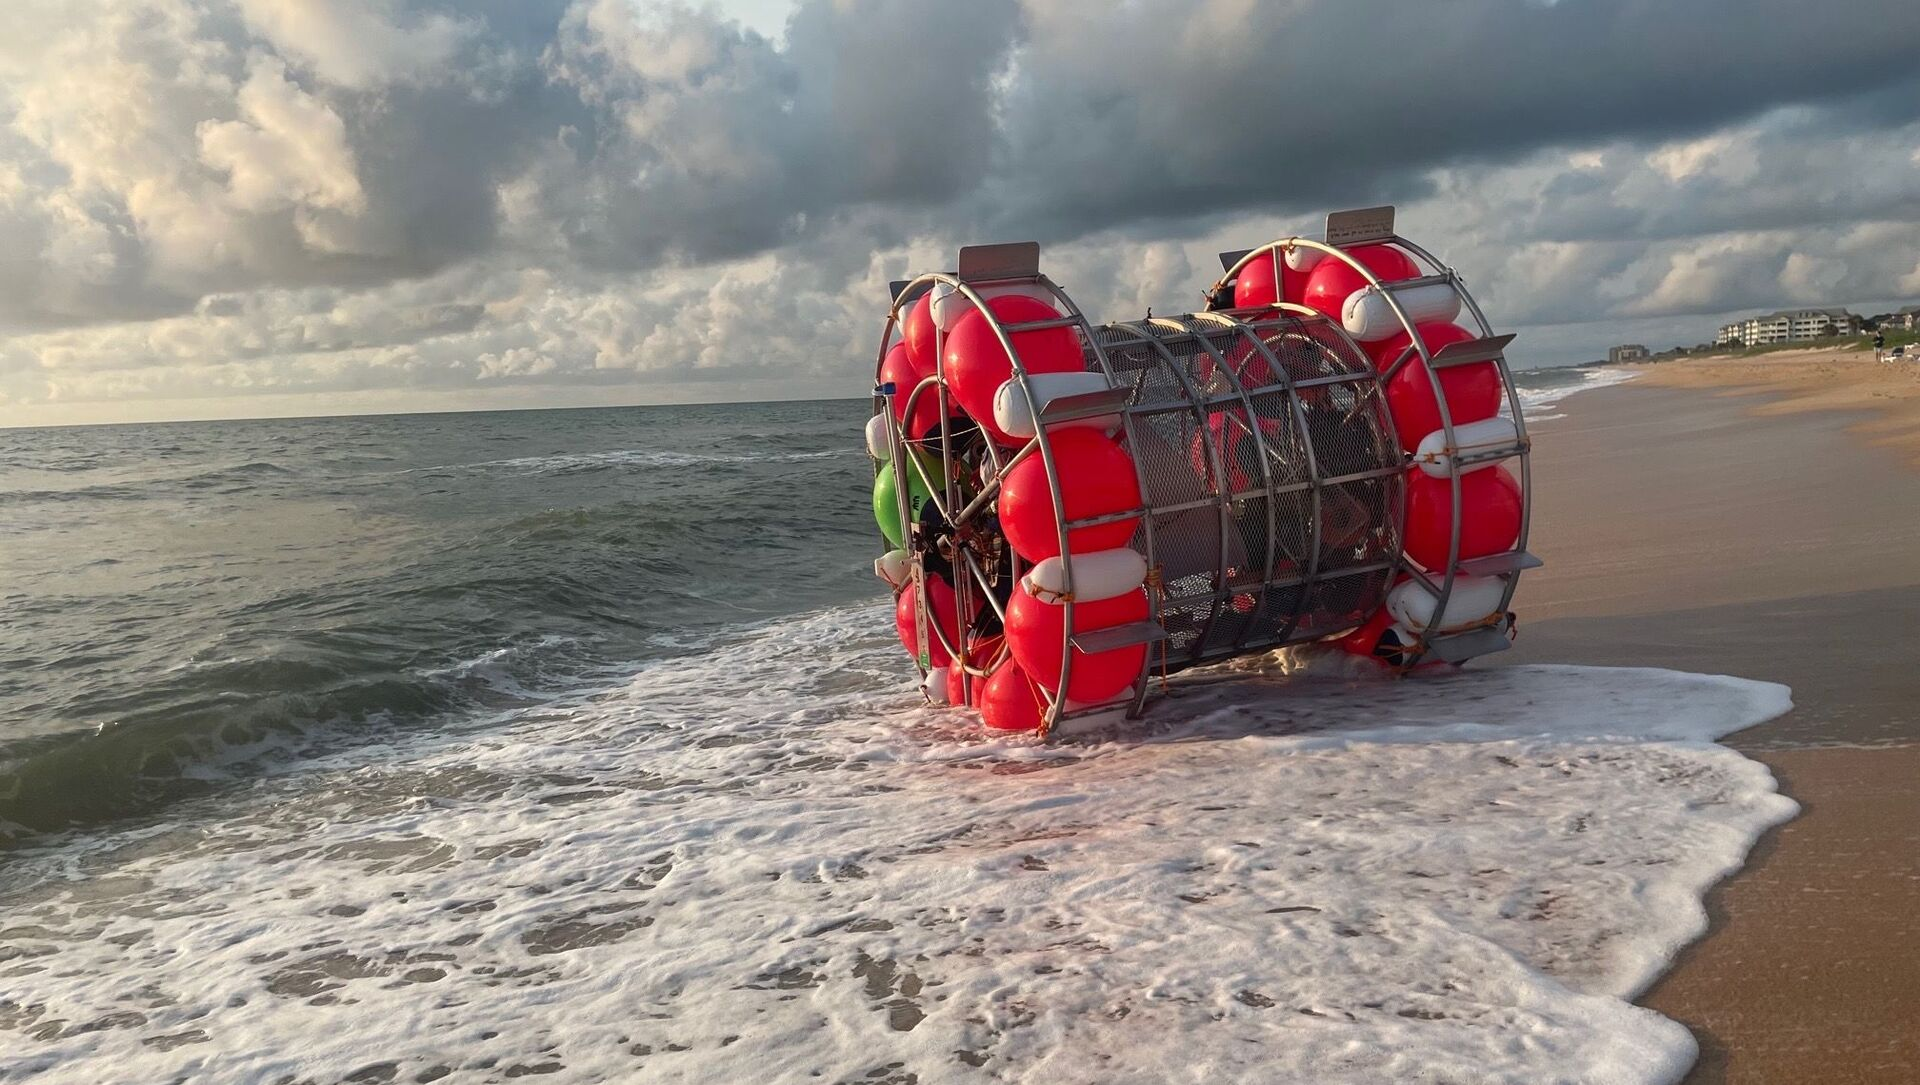 A bubble-like vessel washed ashore in Florida on July 24, 2021. - Sputnik International, 1920, 25.07.2021